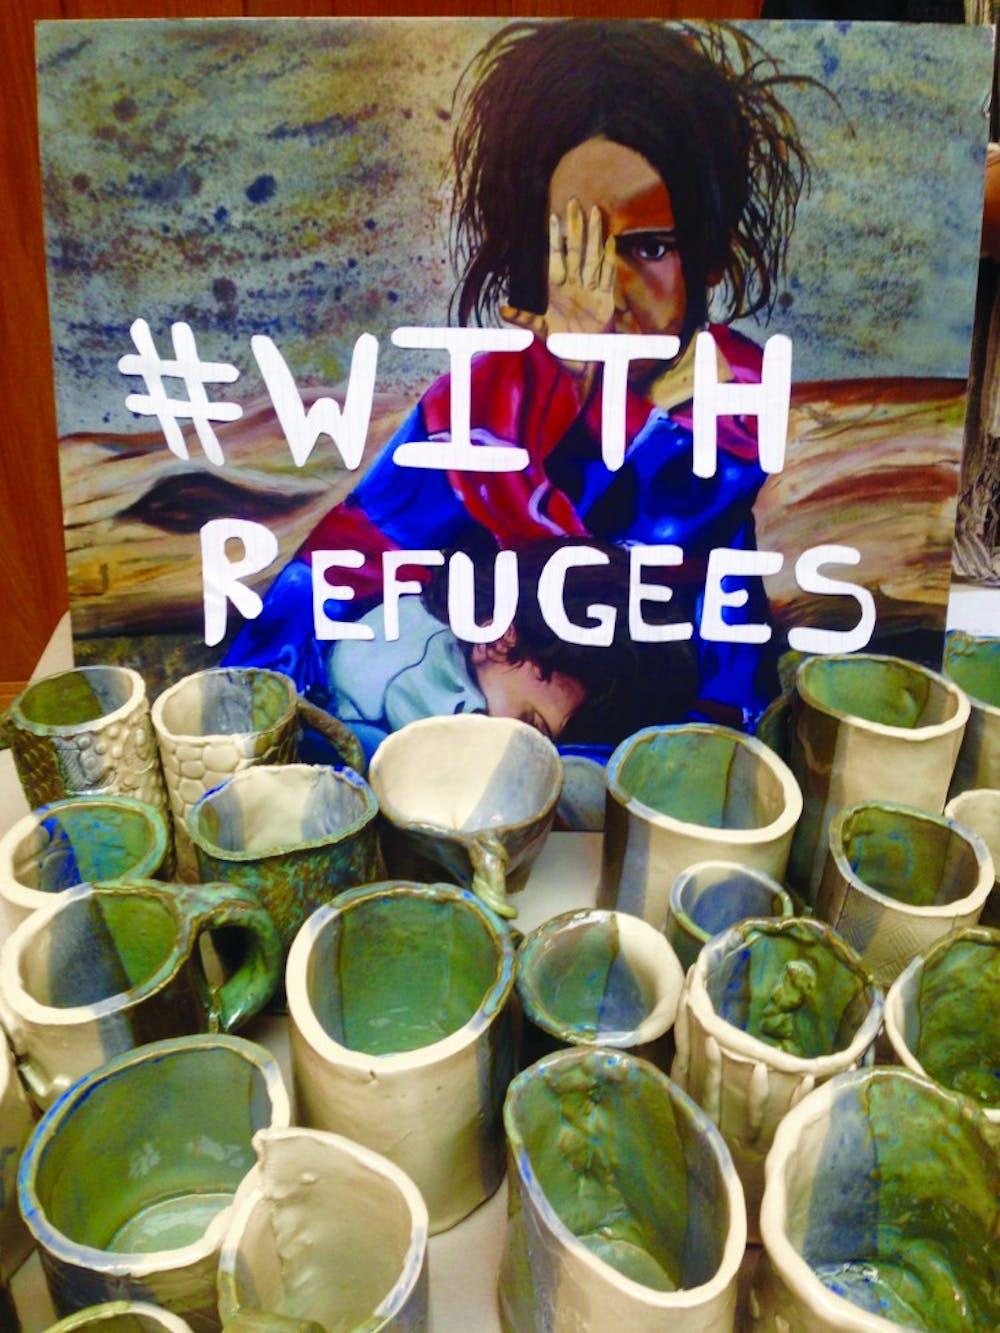 refugees_katherine_wang